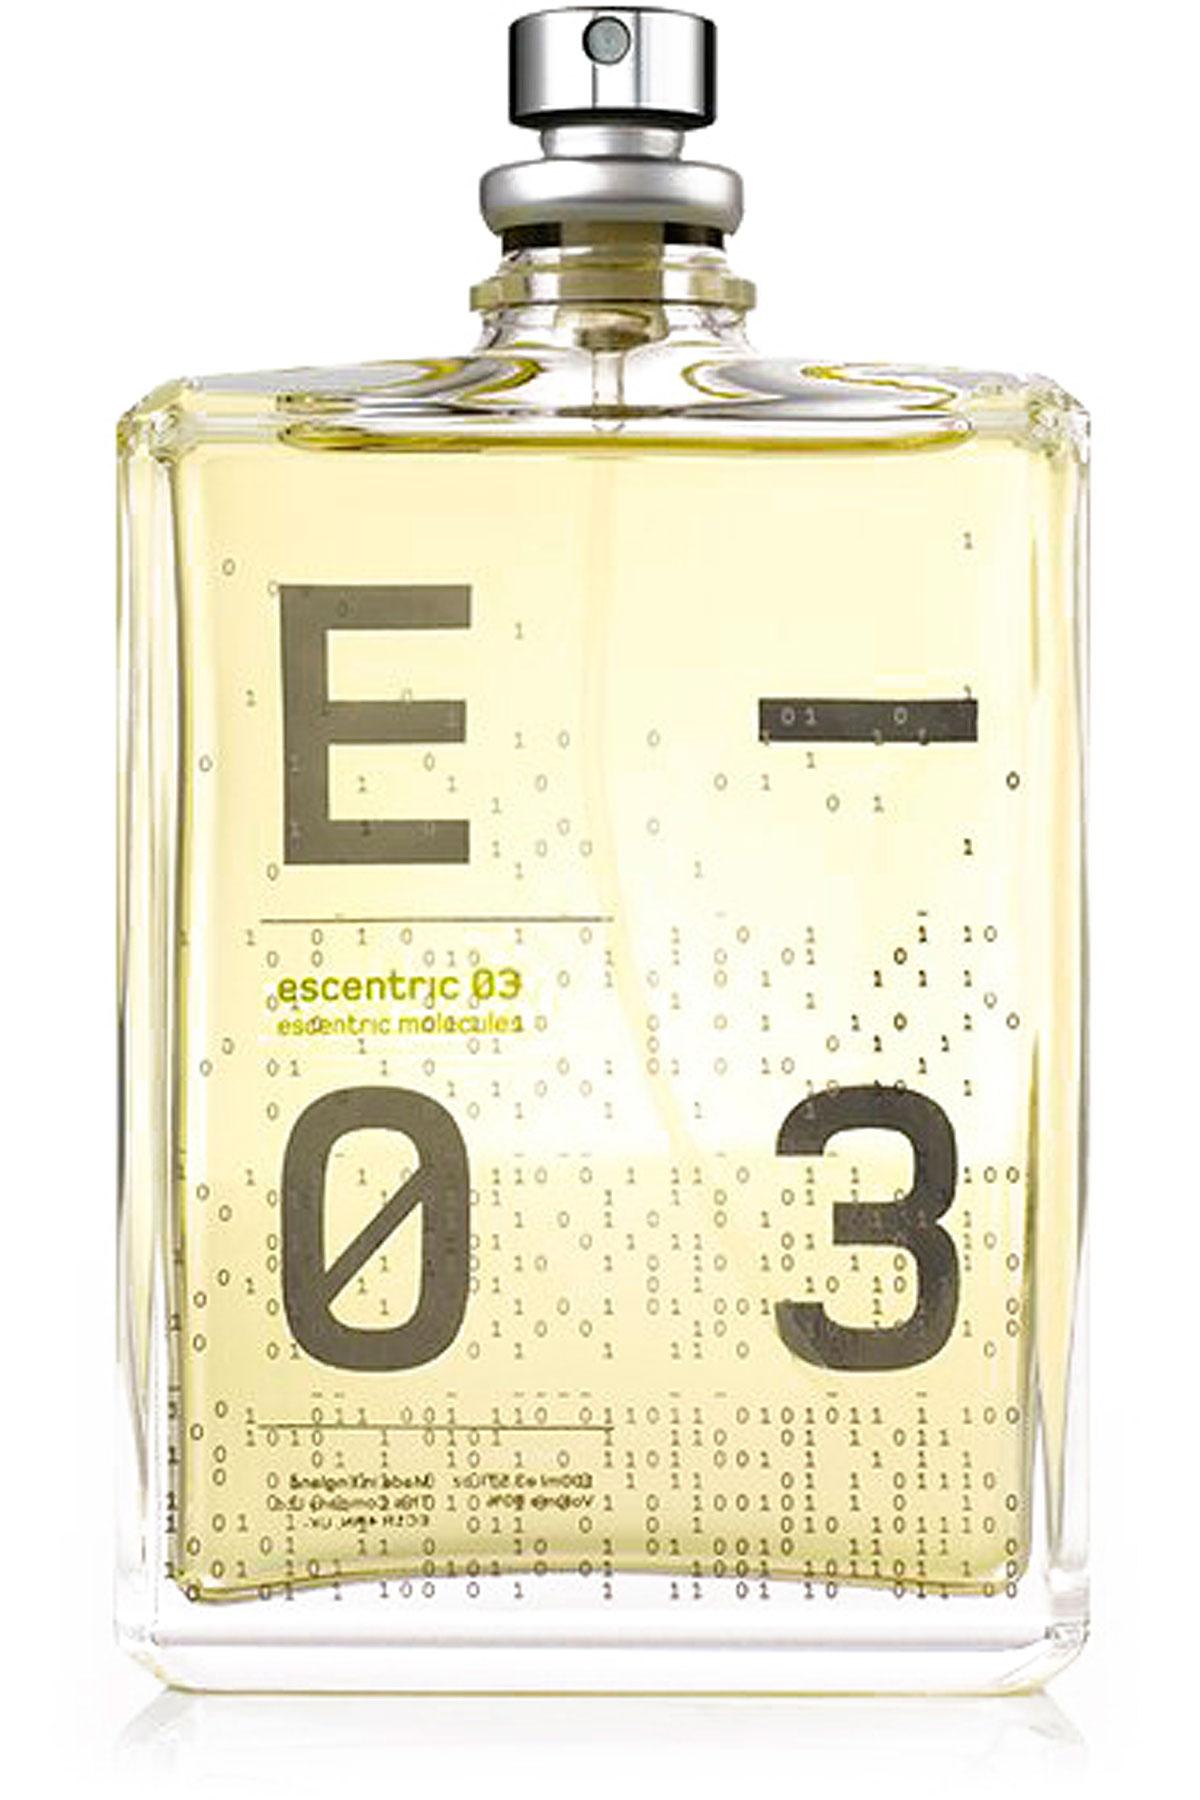 Escentric Molecules Fragrances for Men, Escentric 03 - Eau De Parfum - 100 Ml, 2019, 100 ml